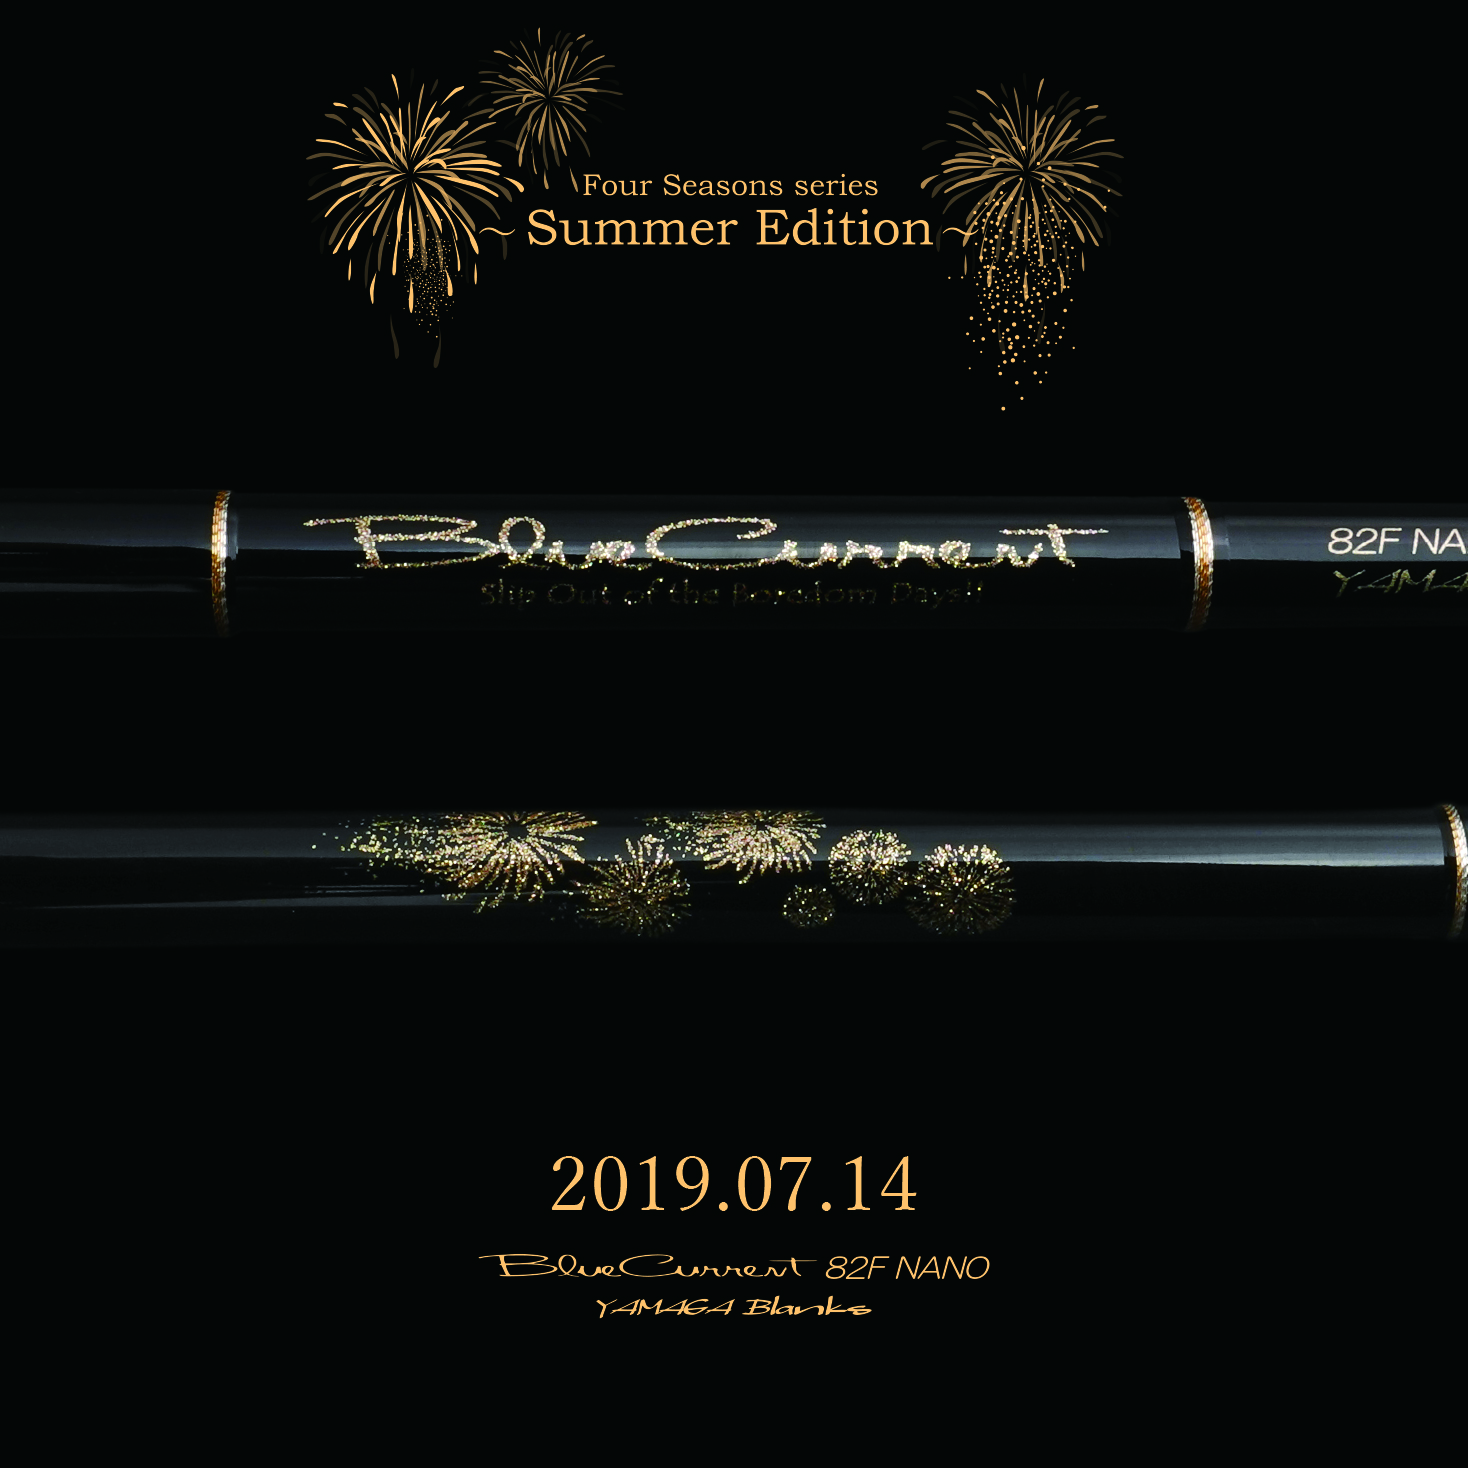 blc82f-summer-ltd.jpg